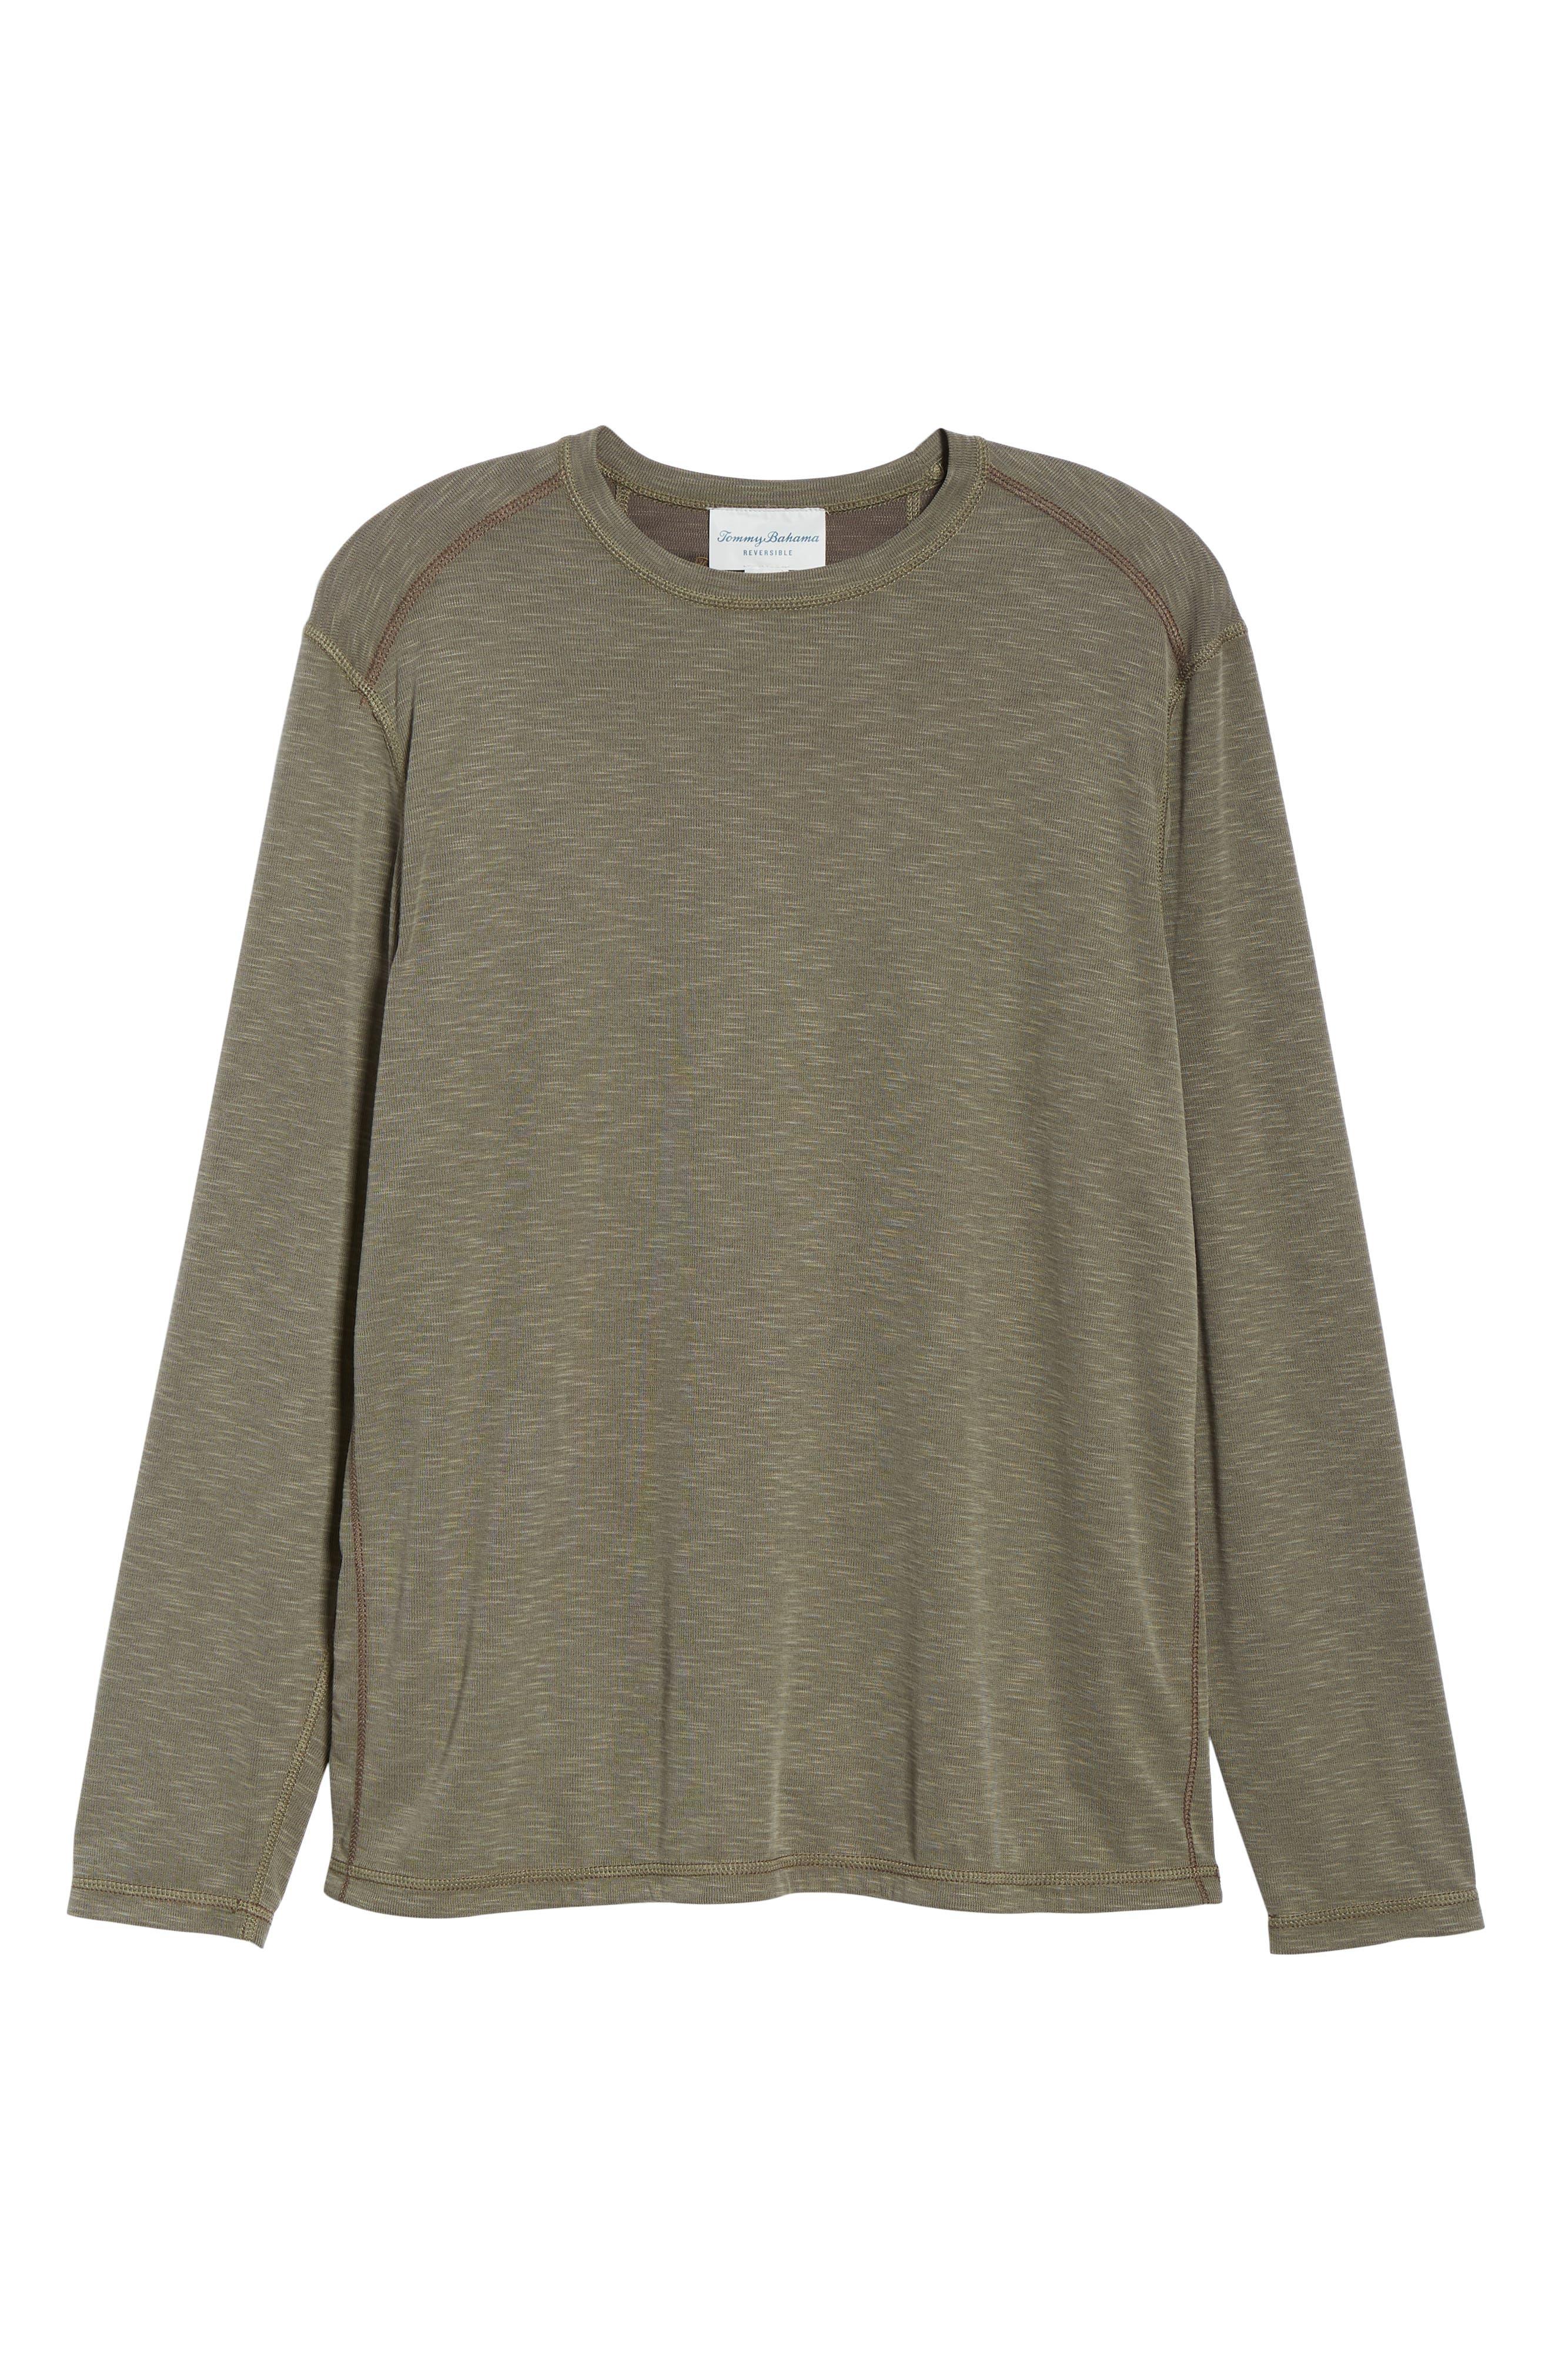 Flip Tide Standard Fit T-Shirt,                             Alternate thumbnail 7, color,                             BITTERSWEET CHOCOLATE